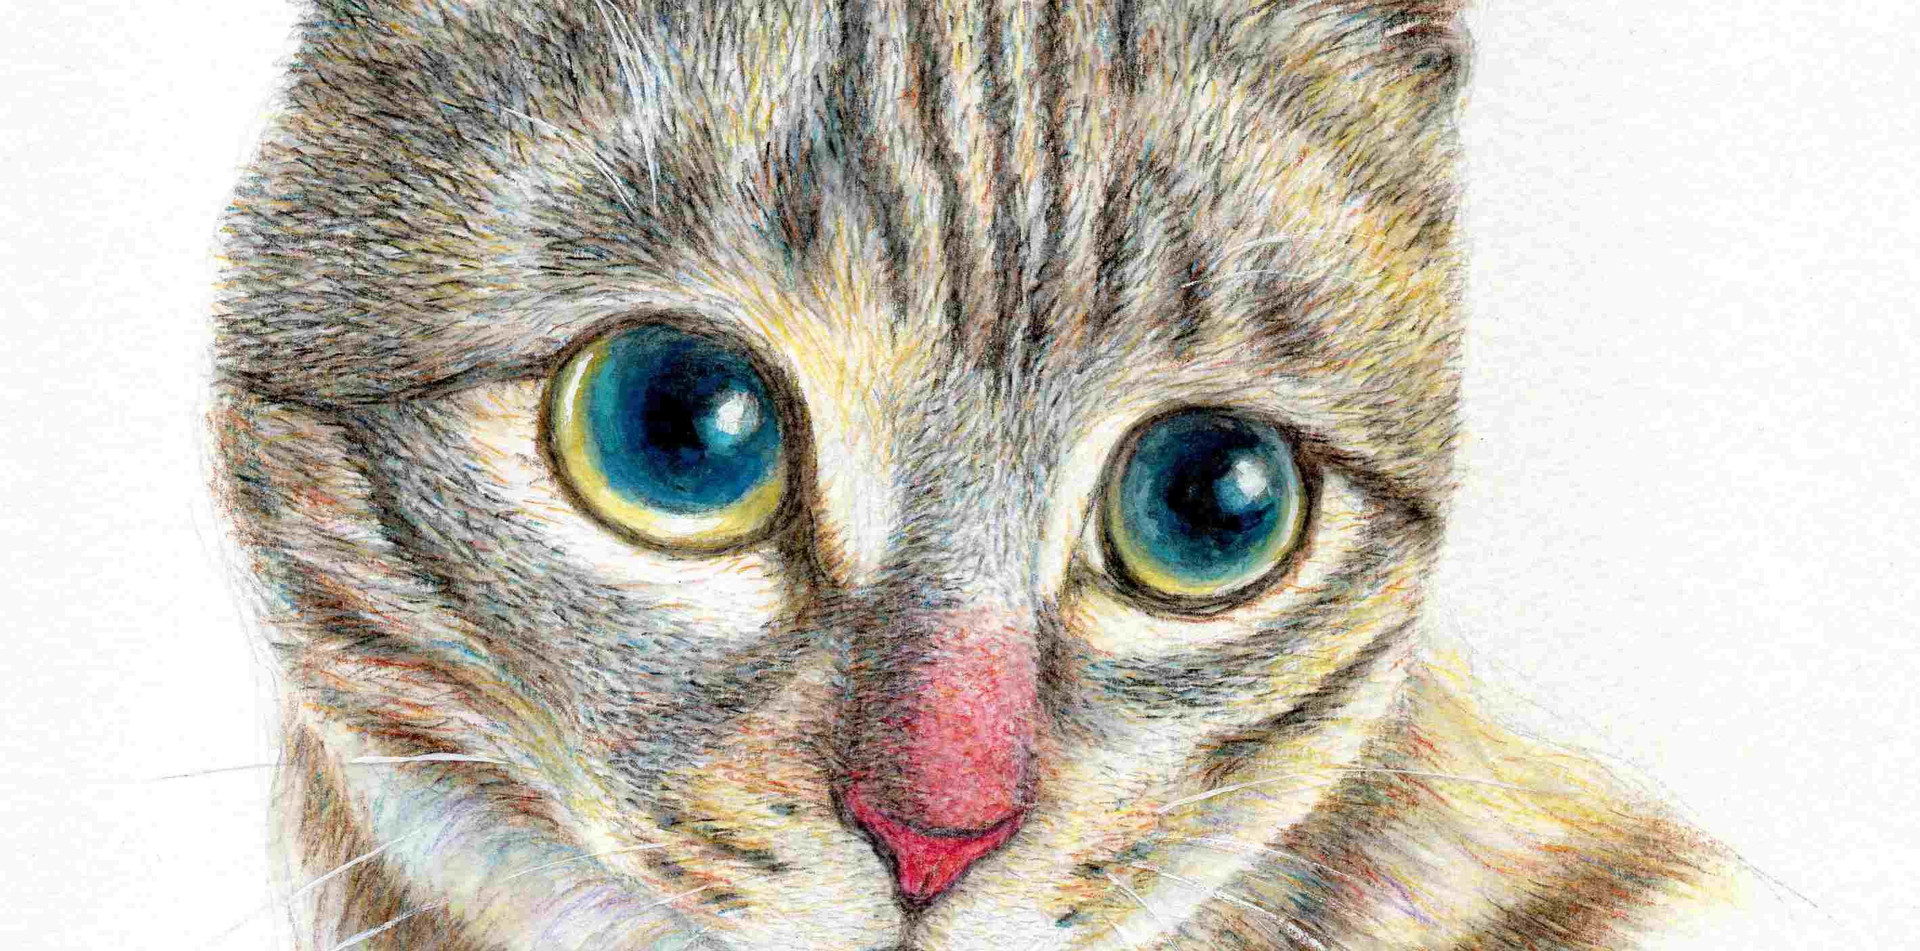 514 - A Grey Tabby Cat